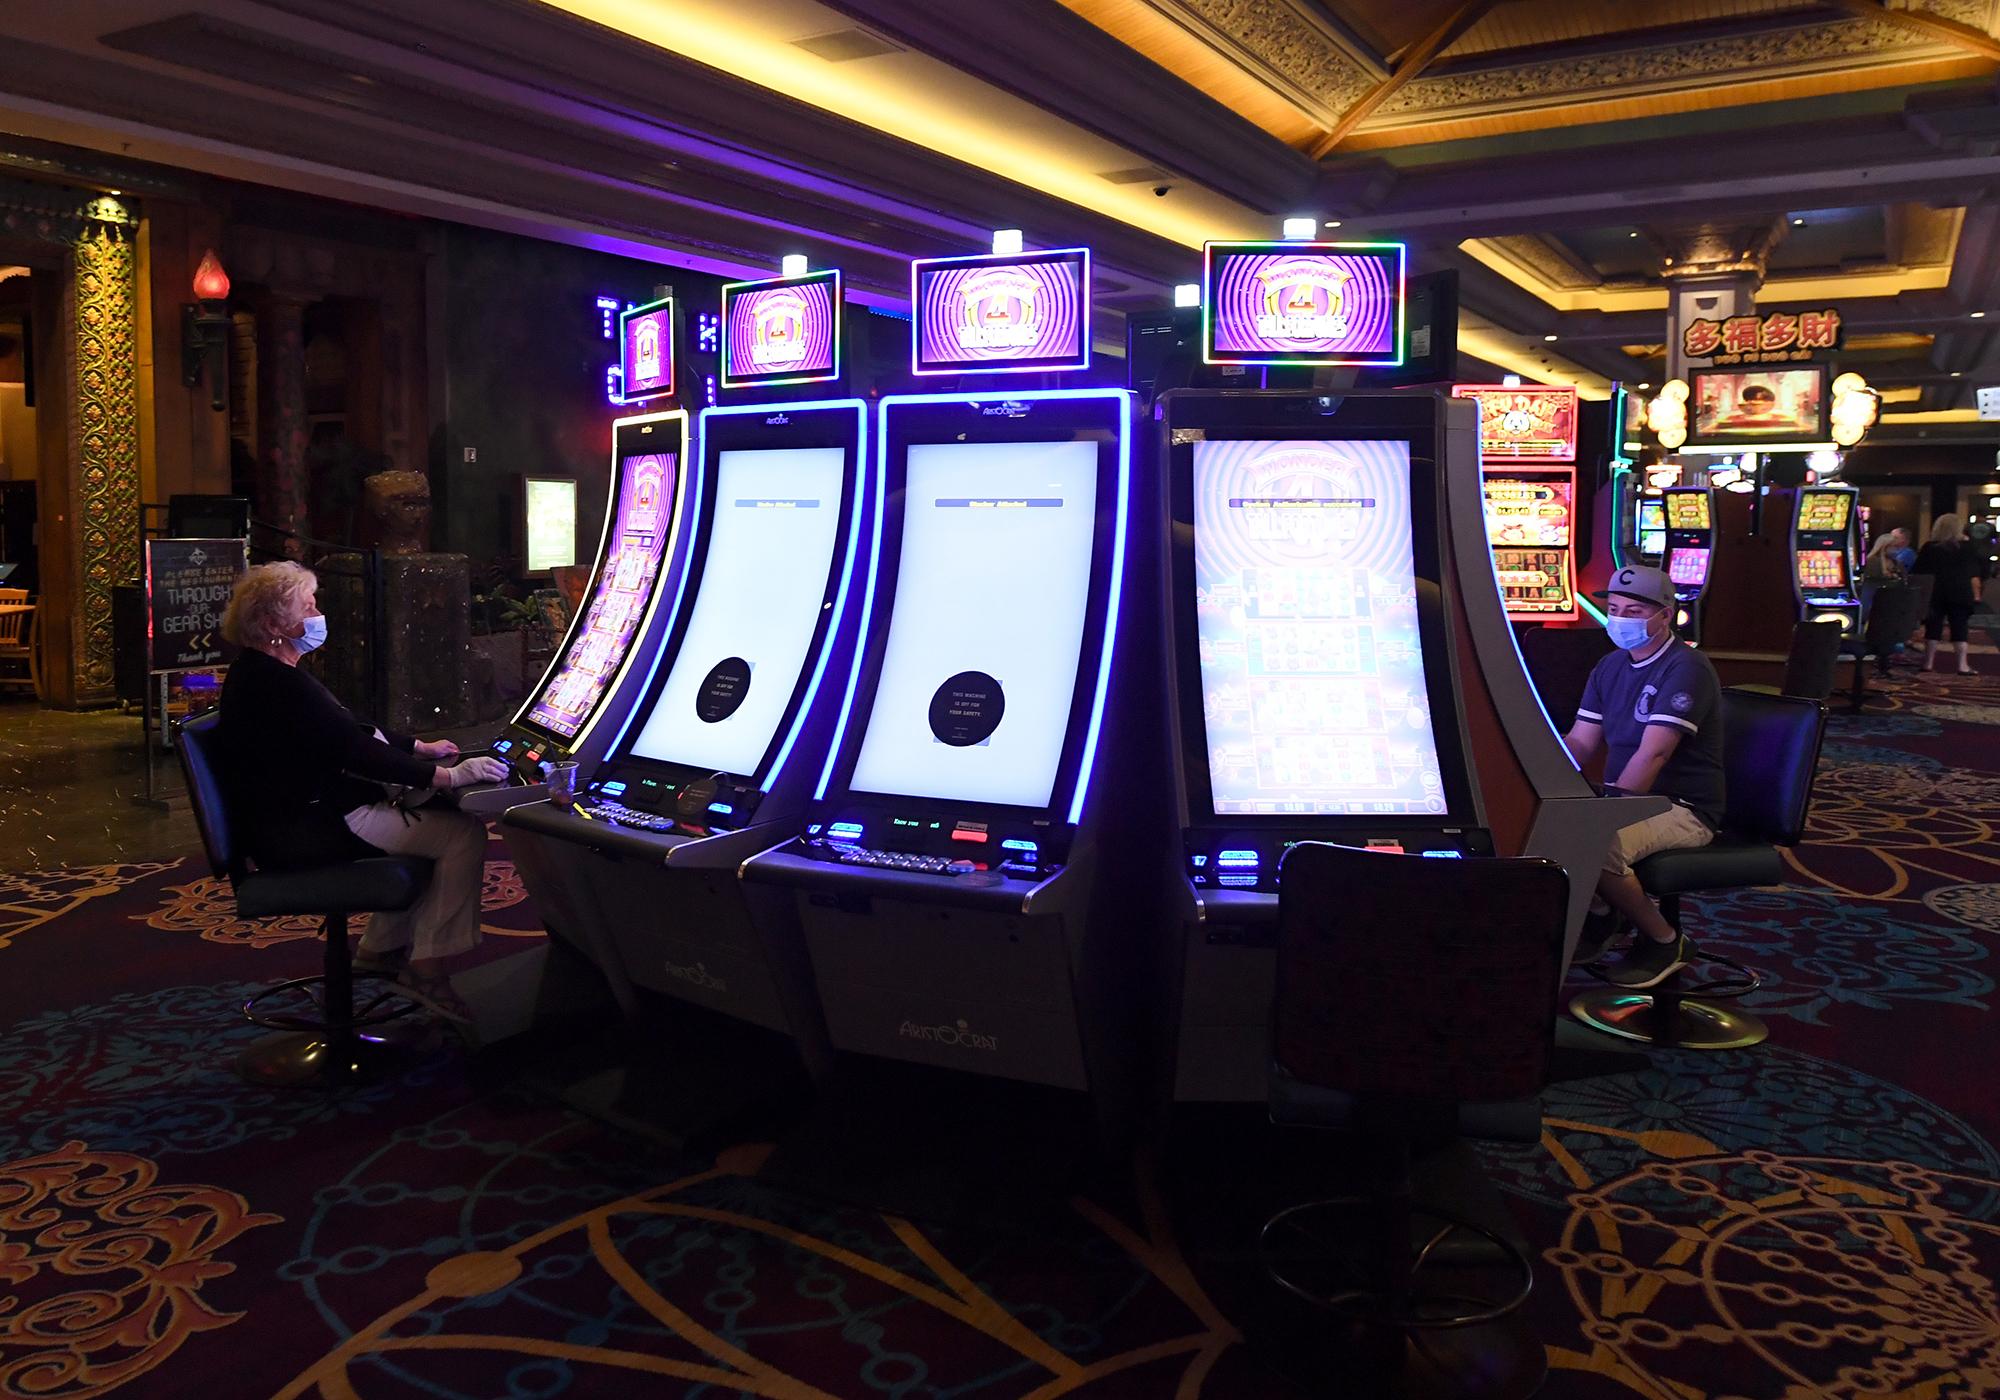 MGM scraps UK gambling takeover after $11 billion bid rejected